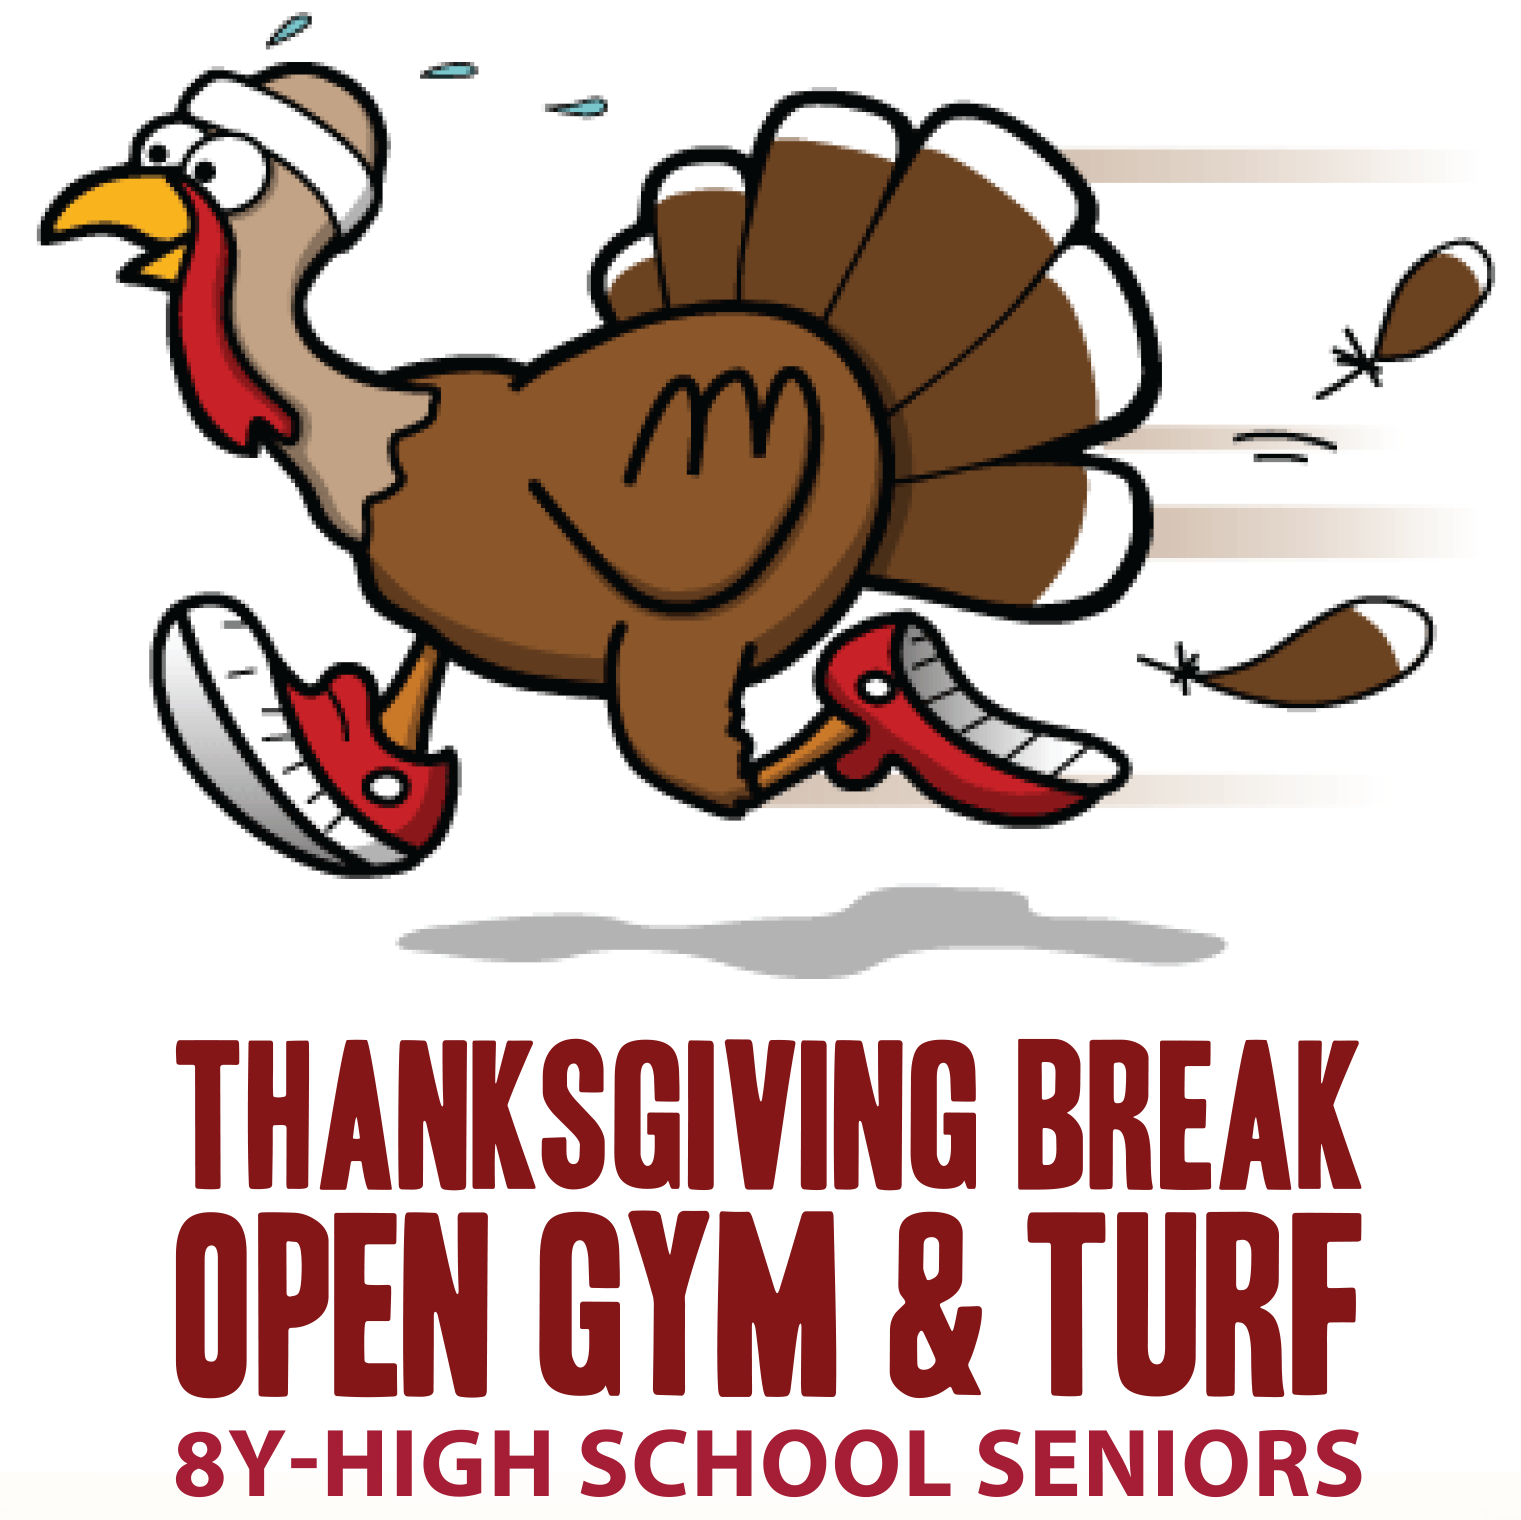 Thanksgiving break open gym. Locker clipart workout room